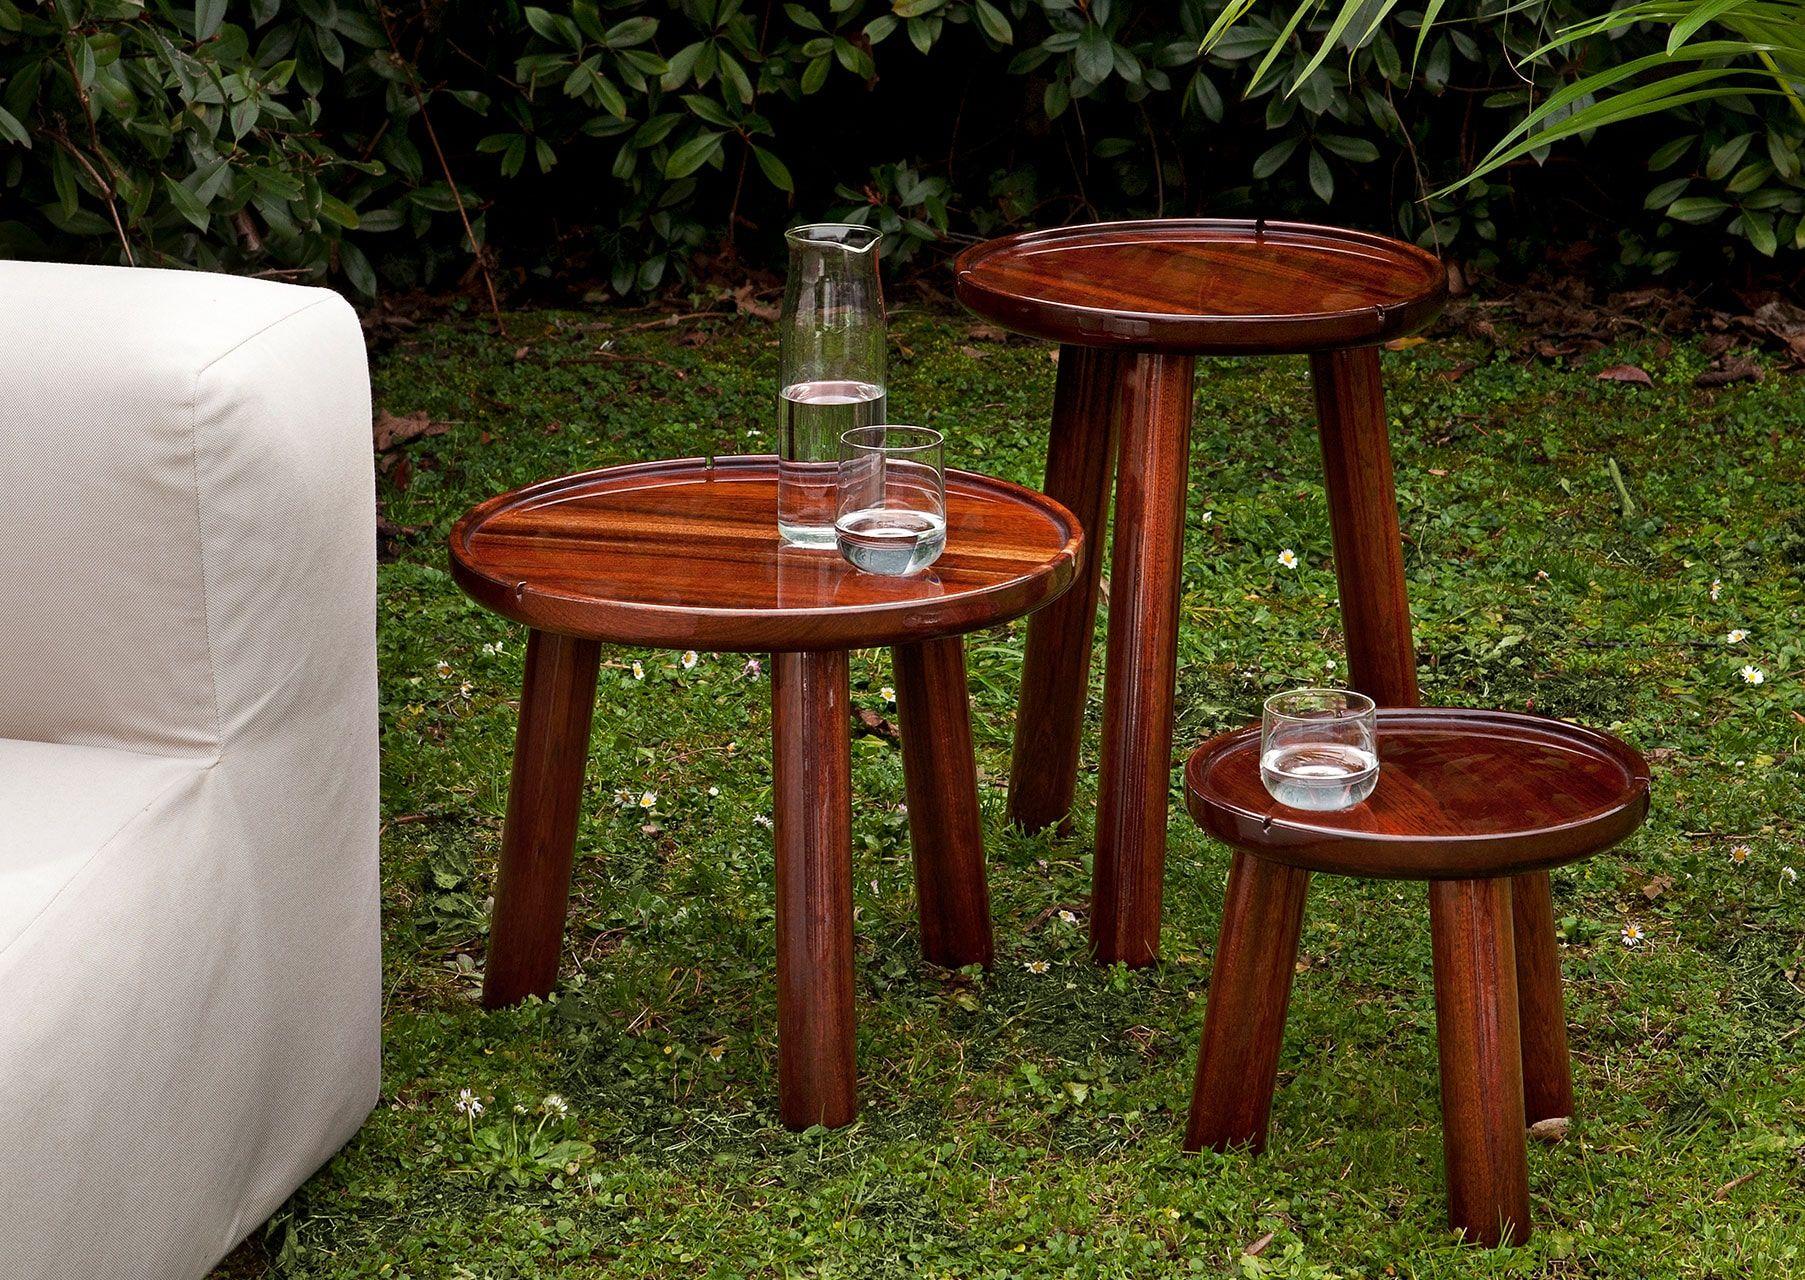 Bellagio Round Coffee Table Shipwrights Exteta En Round Coffee Table Table Coffee Table [ 1280 x 1805 Pixel ]